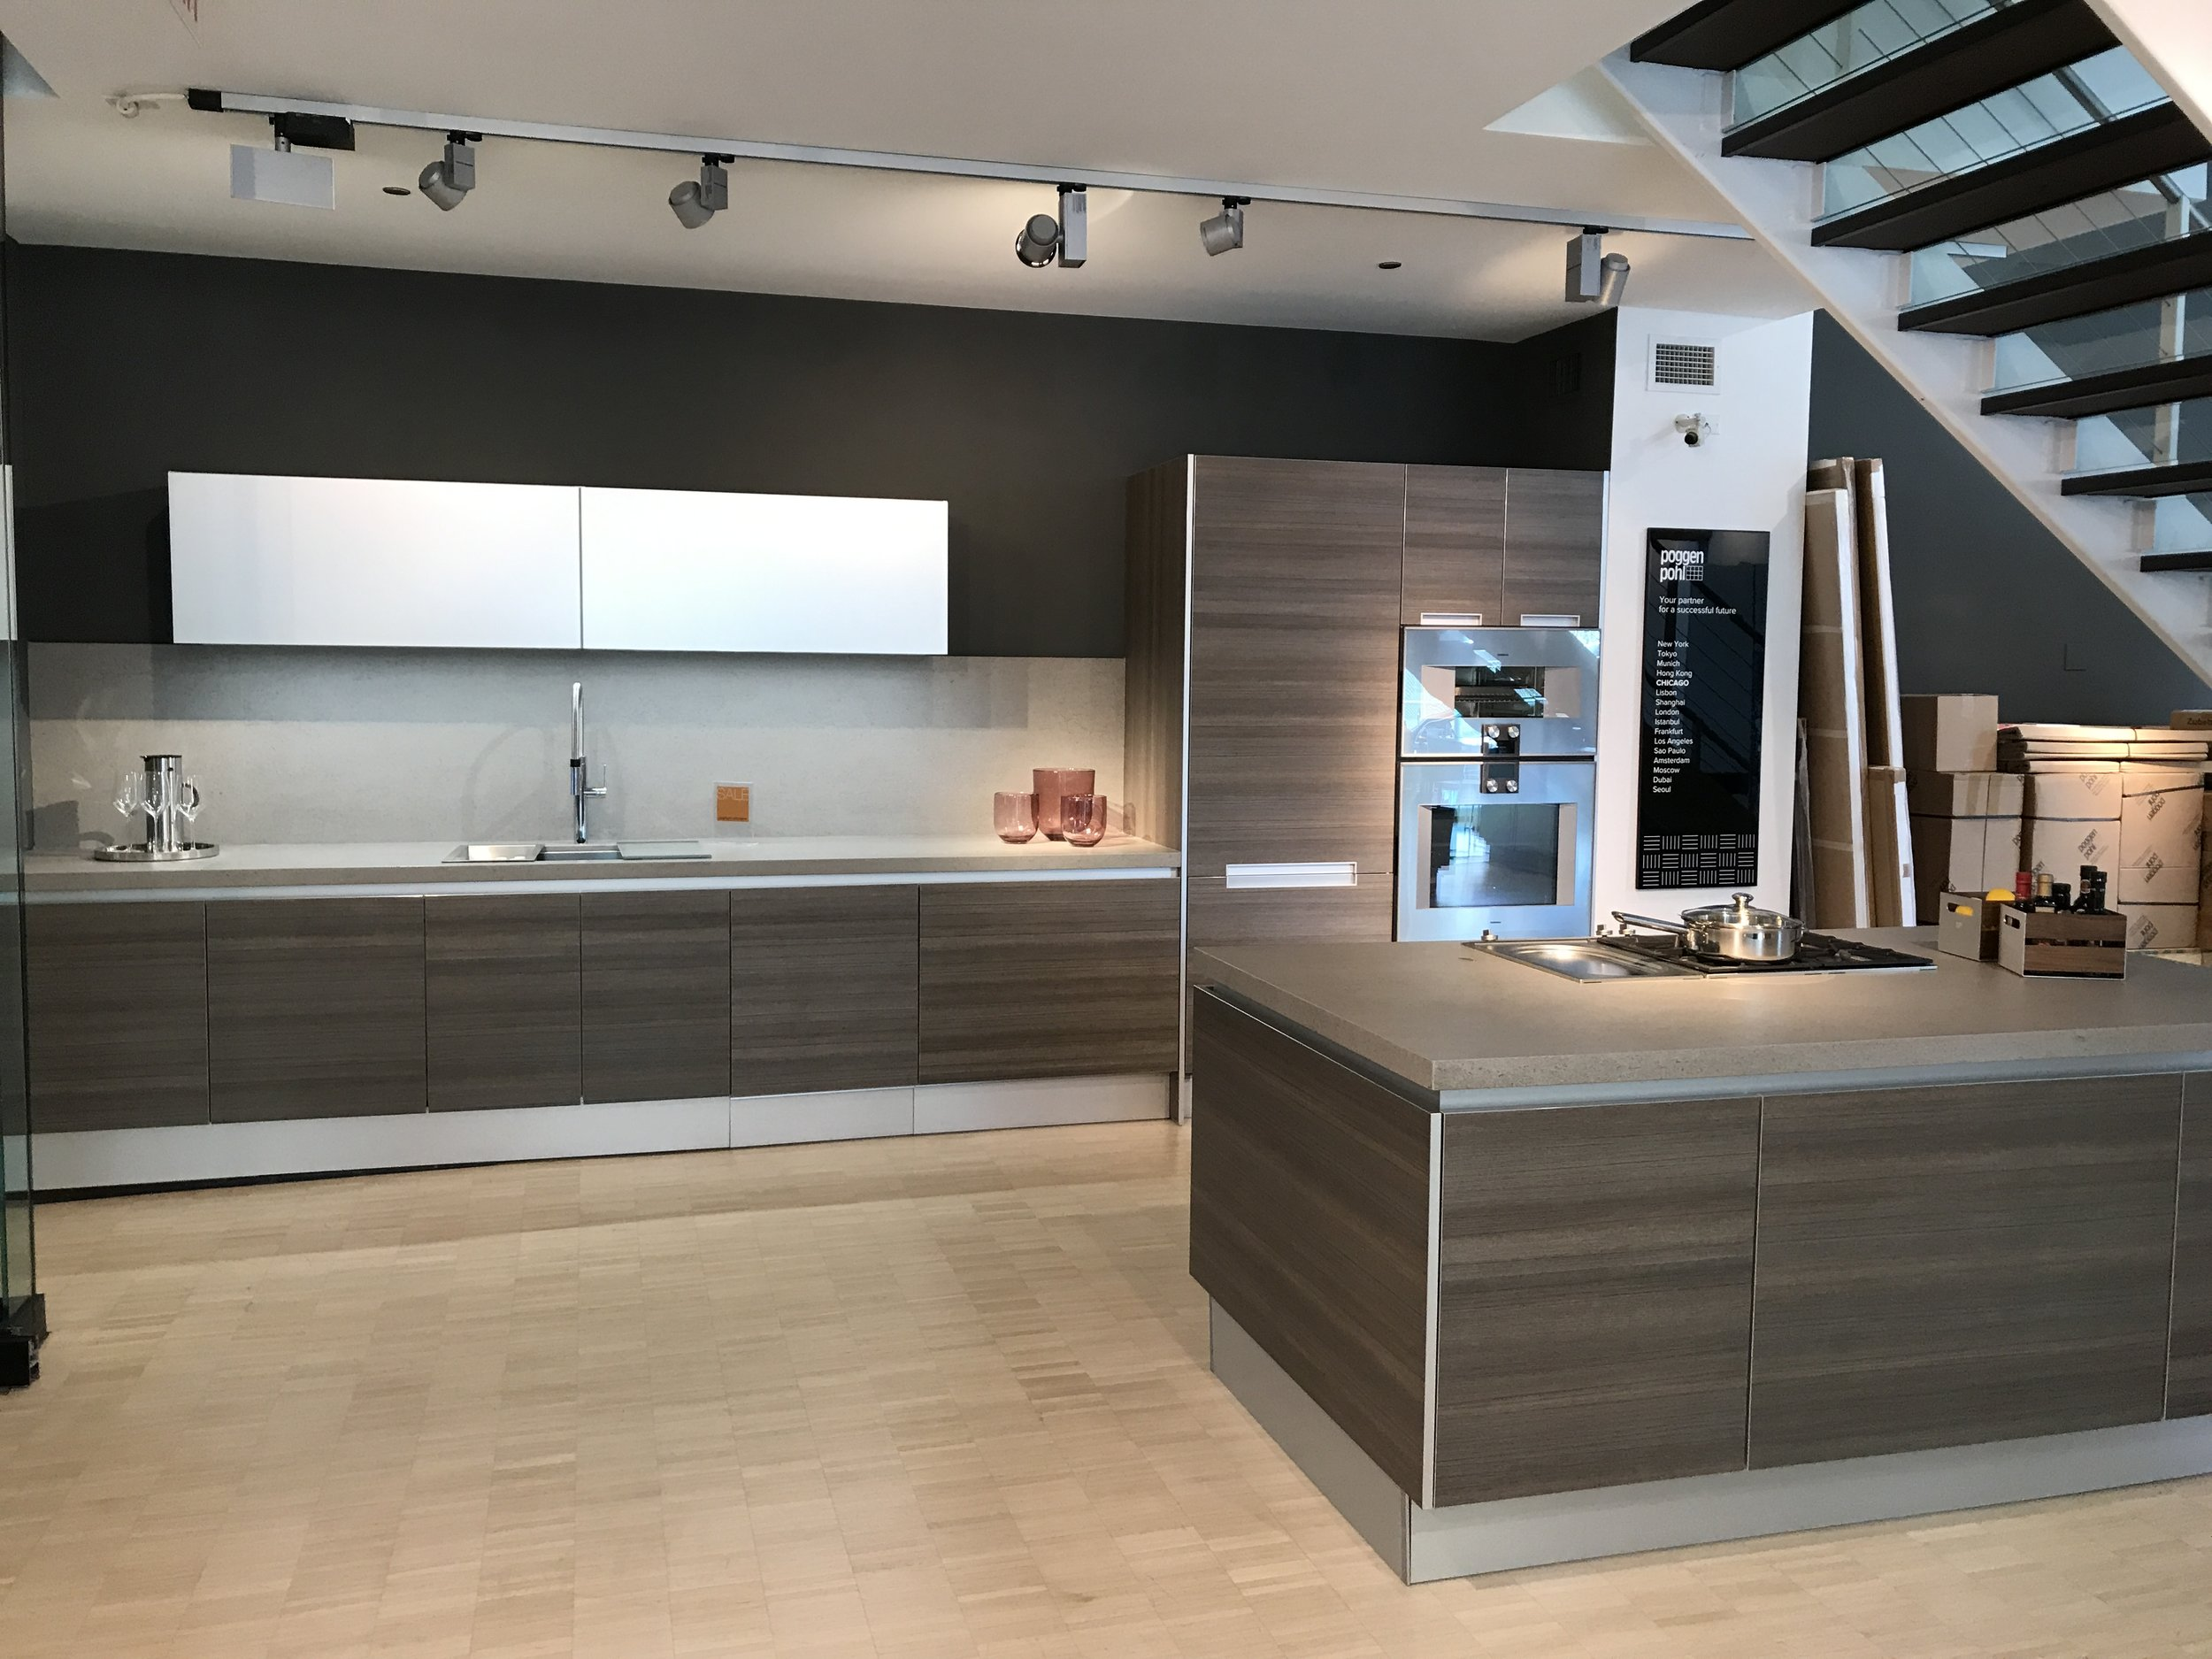 complete kitchen lantern pendant lights for new poggenpohl appliances marble counter gaggenau